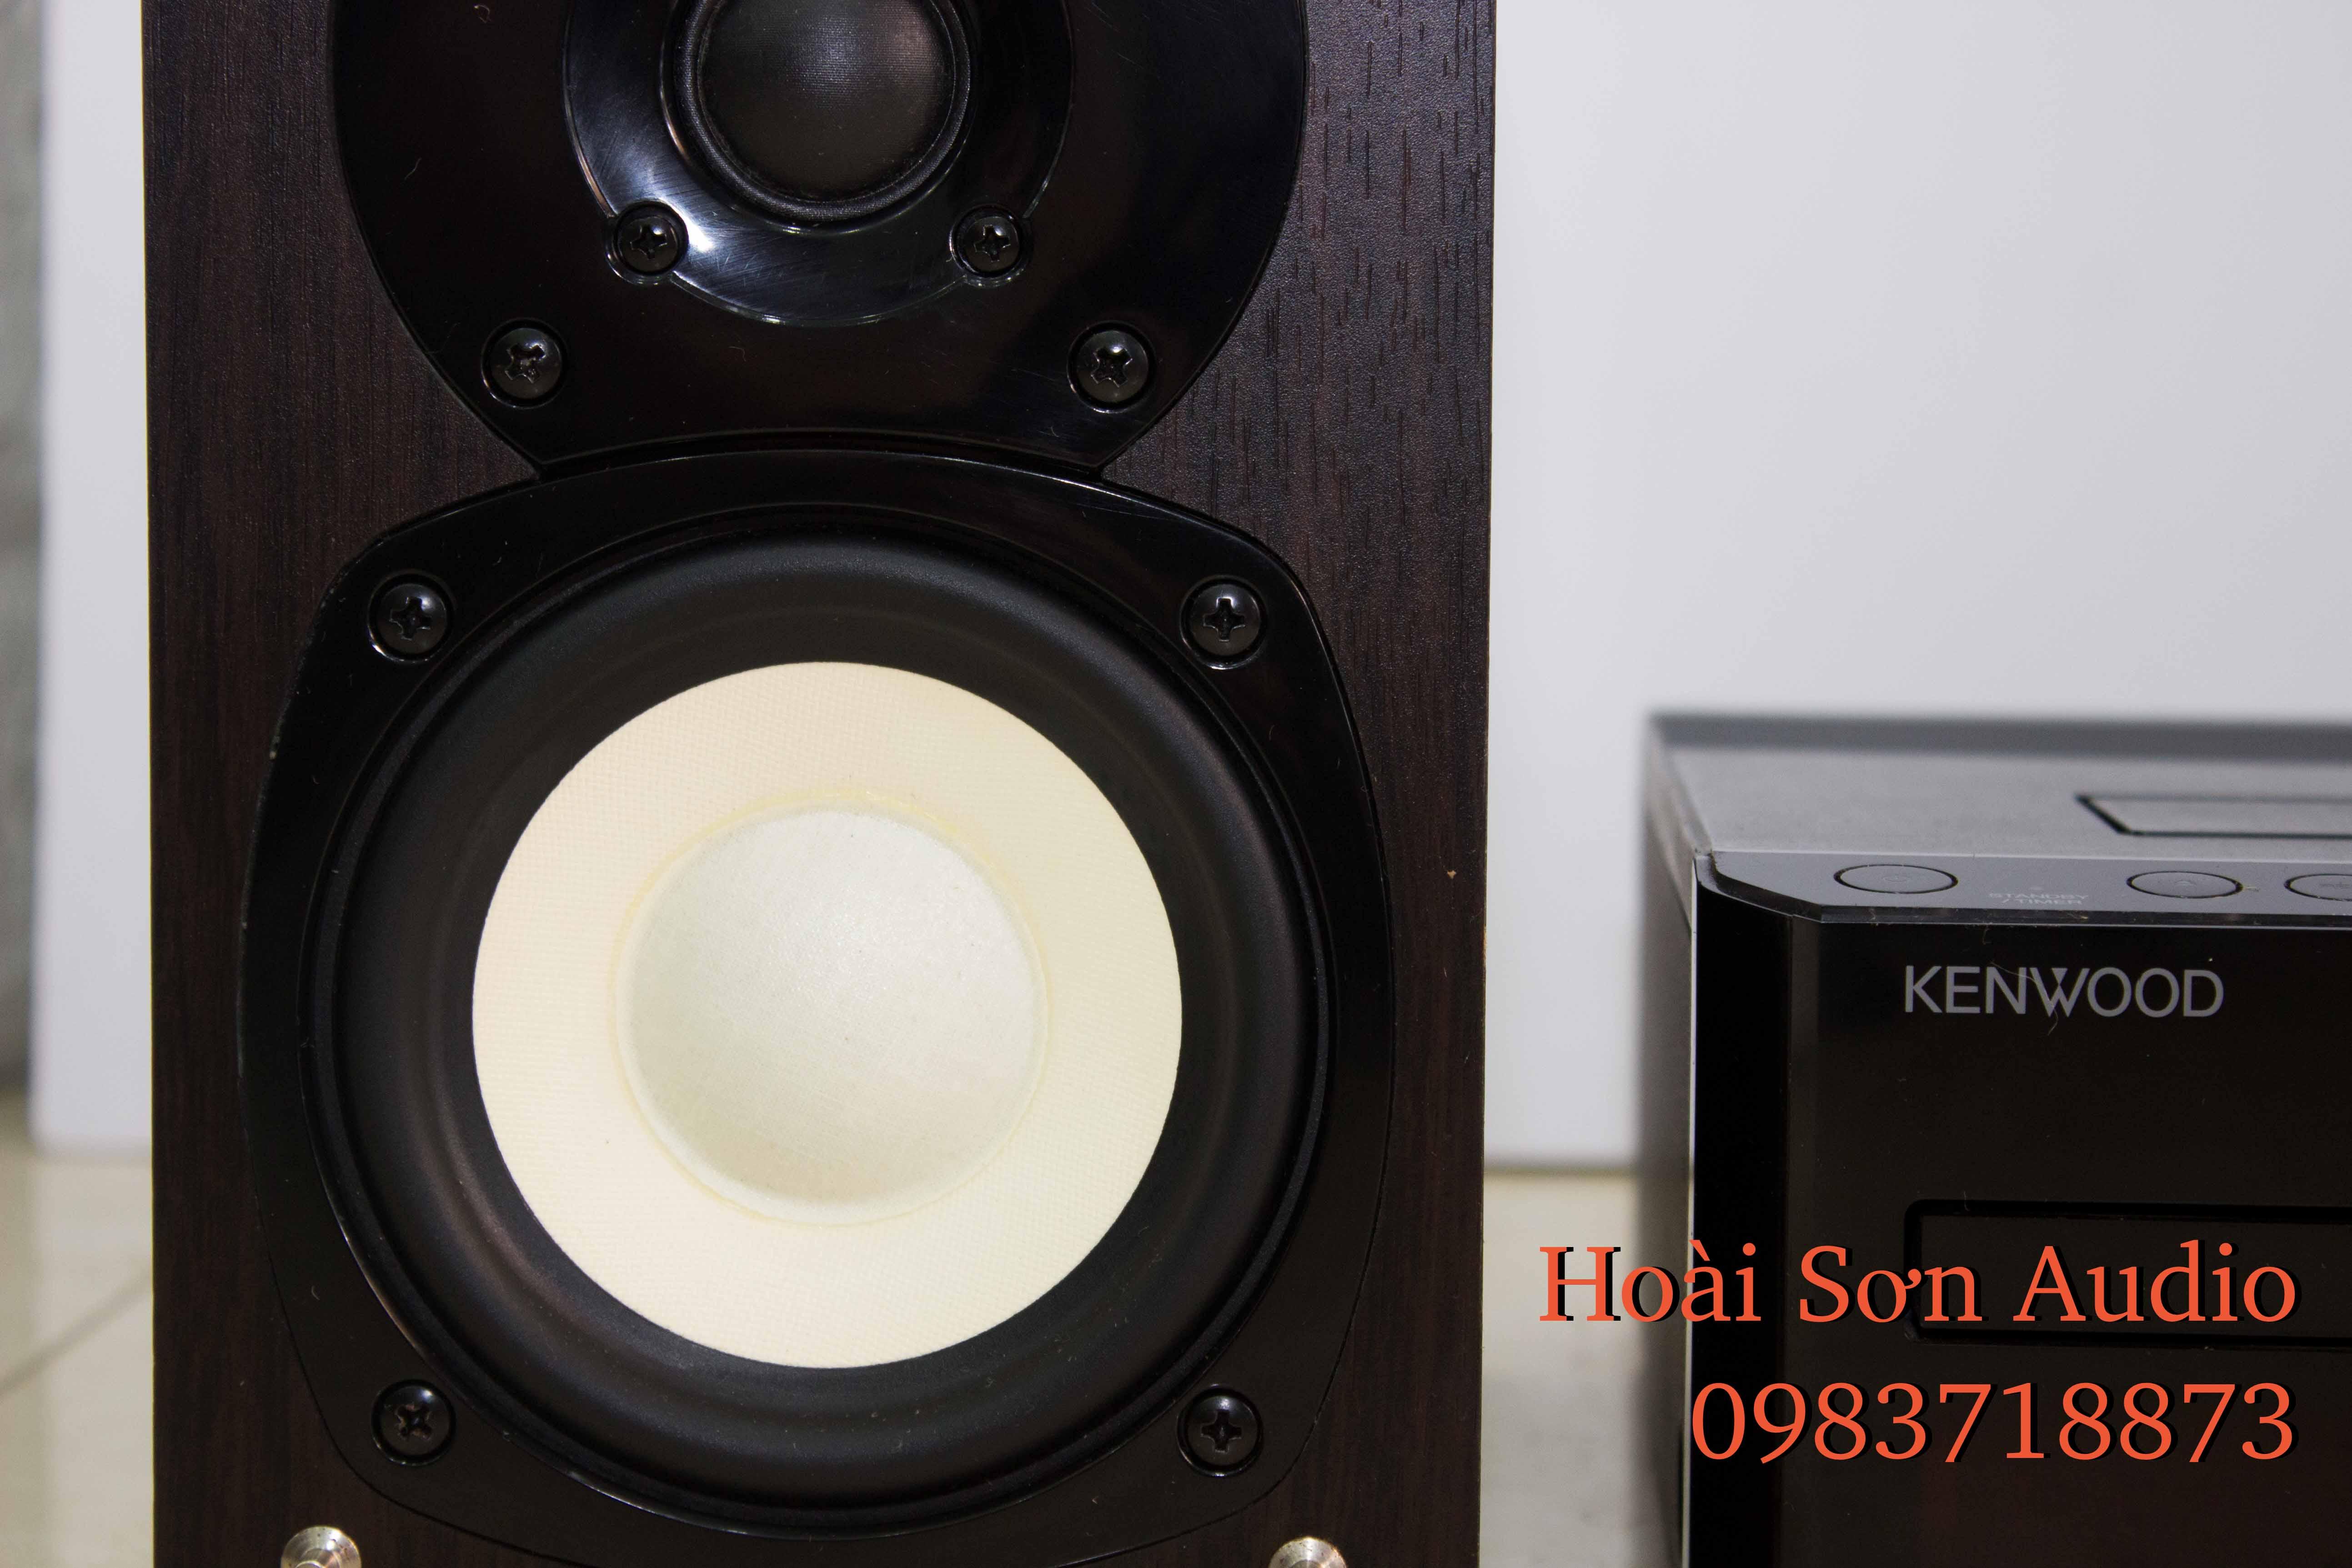 KENWOOD K531